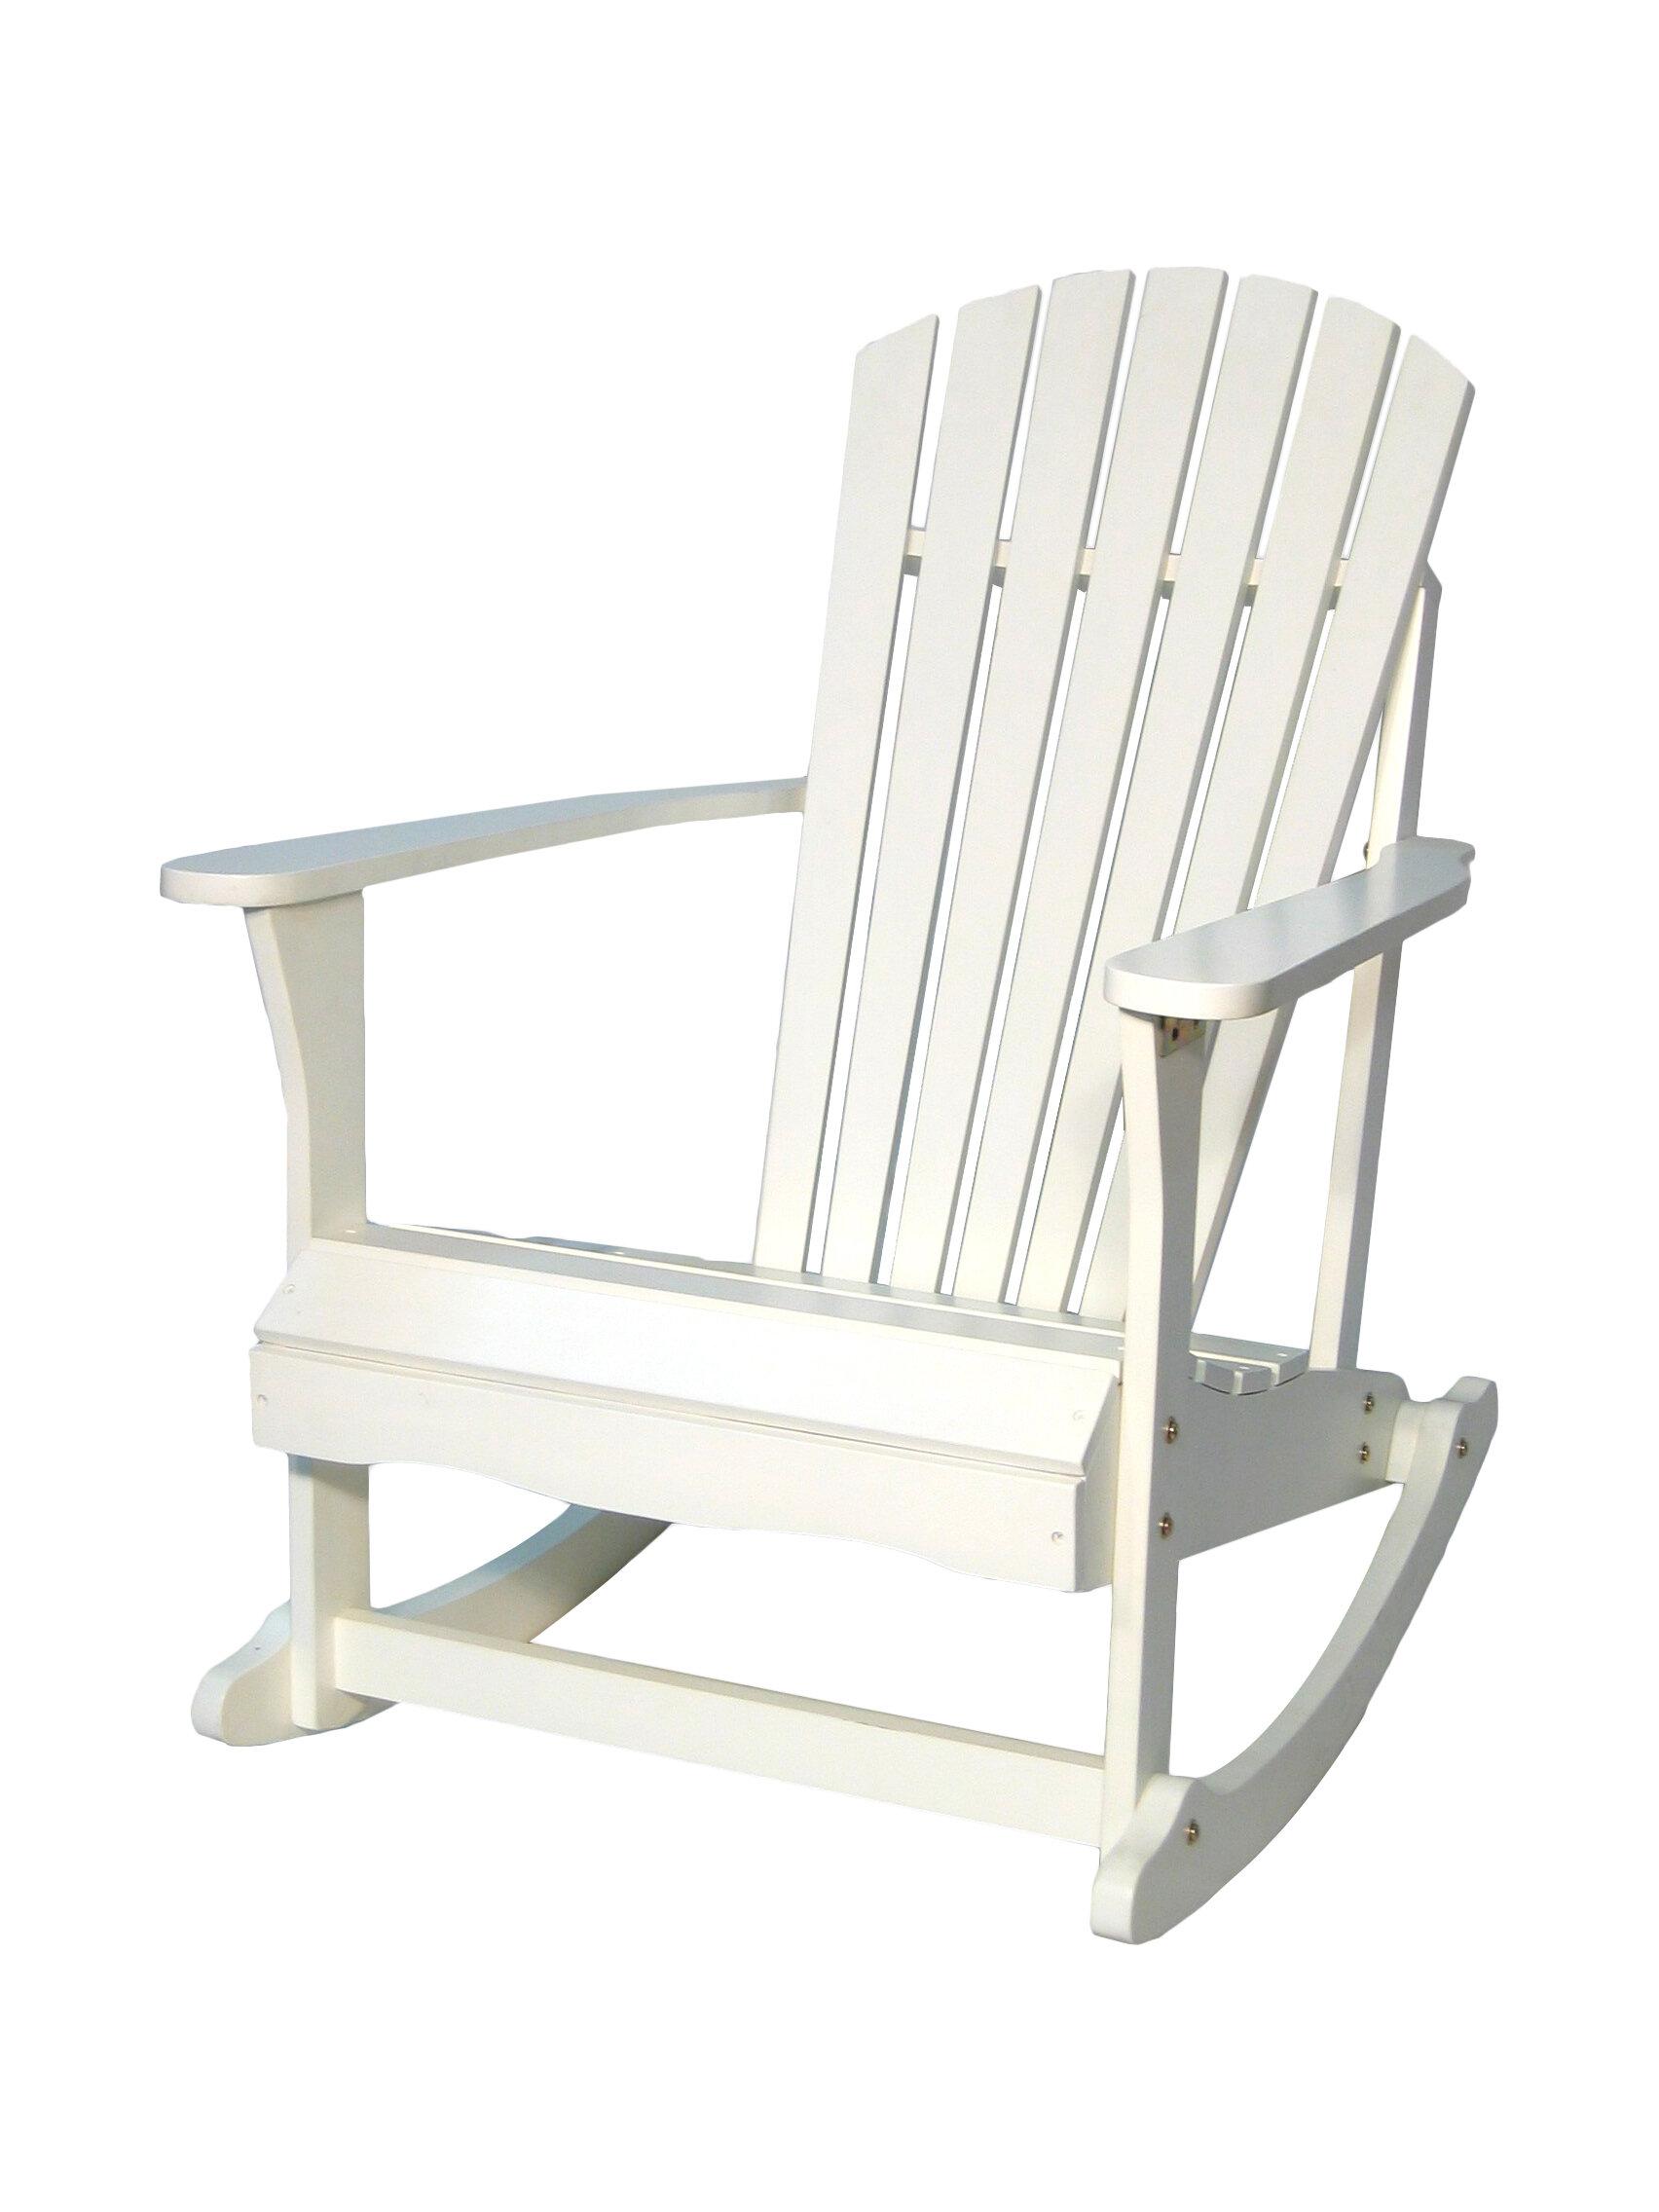 Highland Dunes Hinman Porch Solid Wood Rocking Adirondack Chair U0026 Reviews |  Wayfair